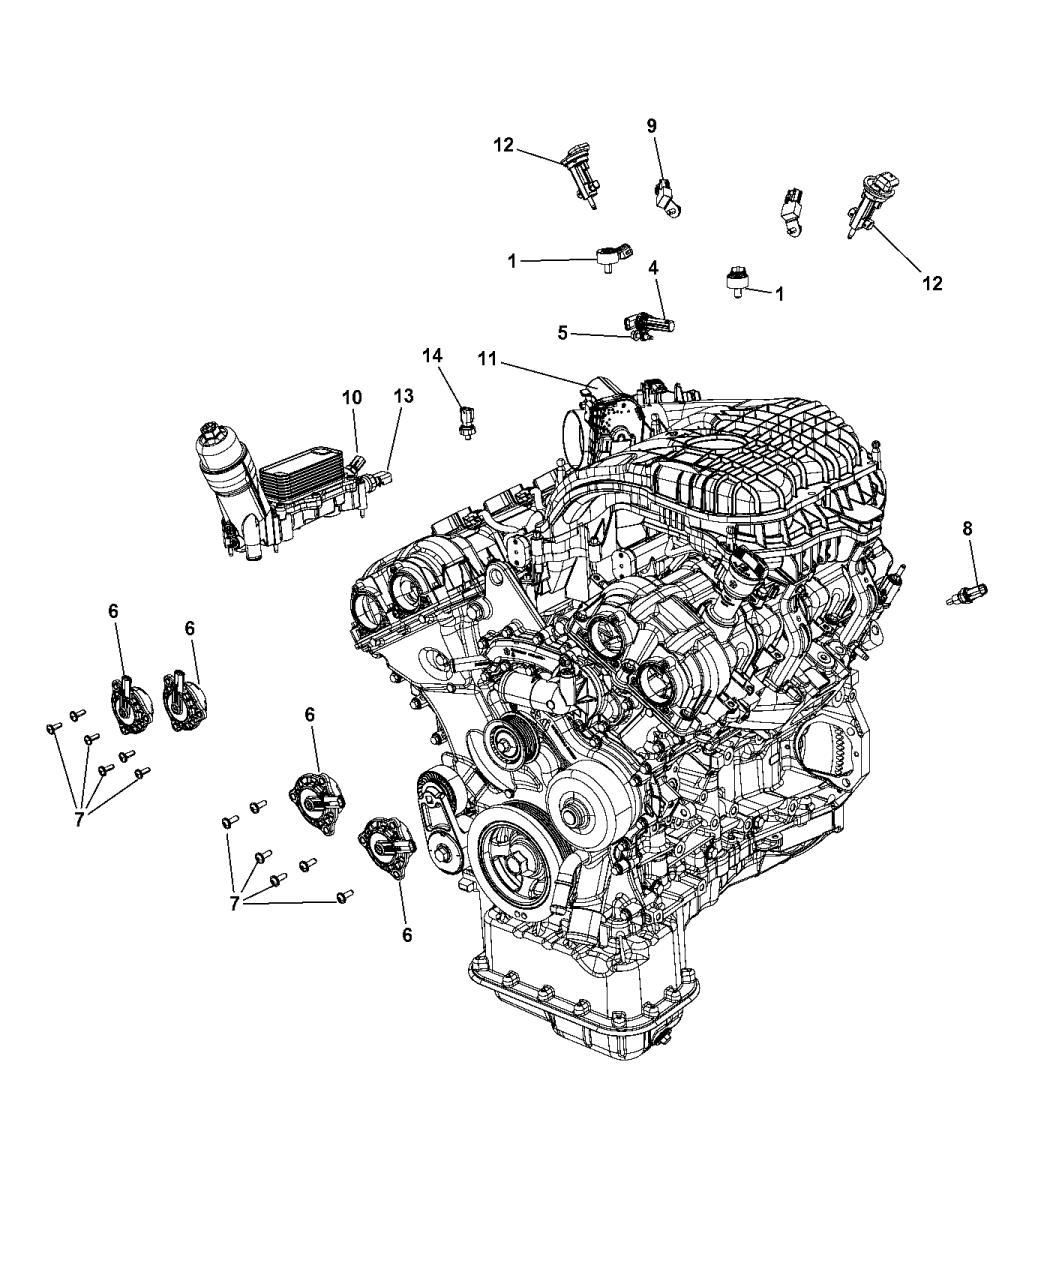 Chrysler Lhs Engine Diagram Also Dodge Grand Caravan Engine Diagram As